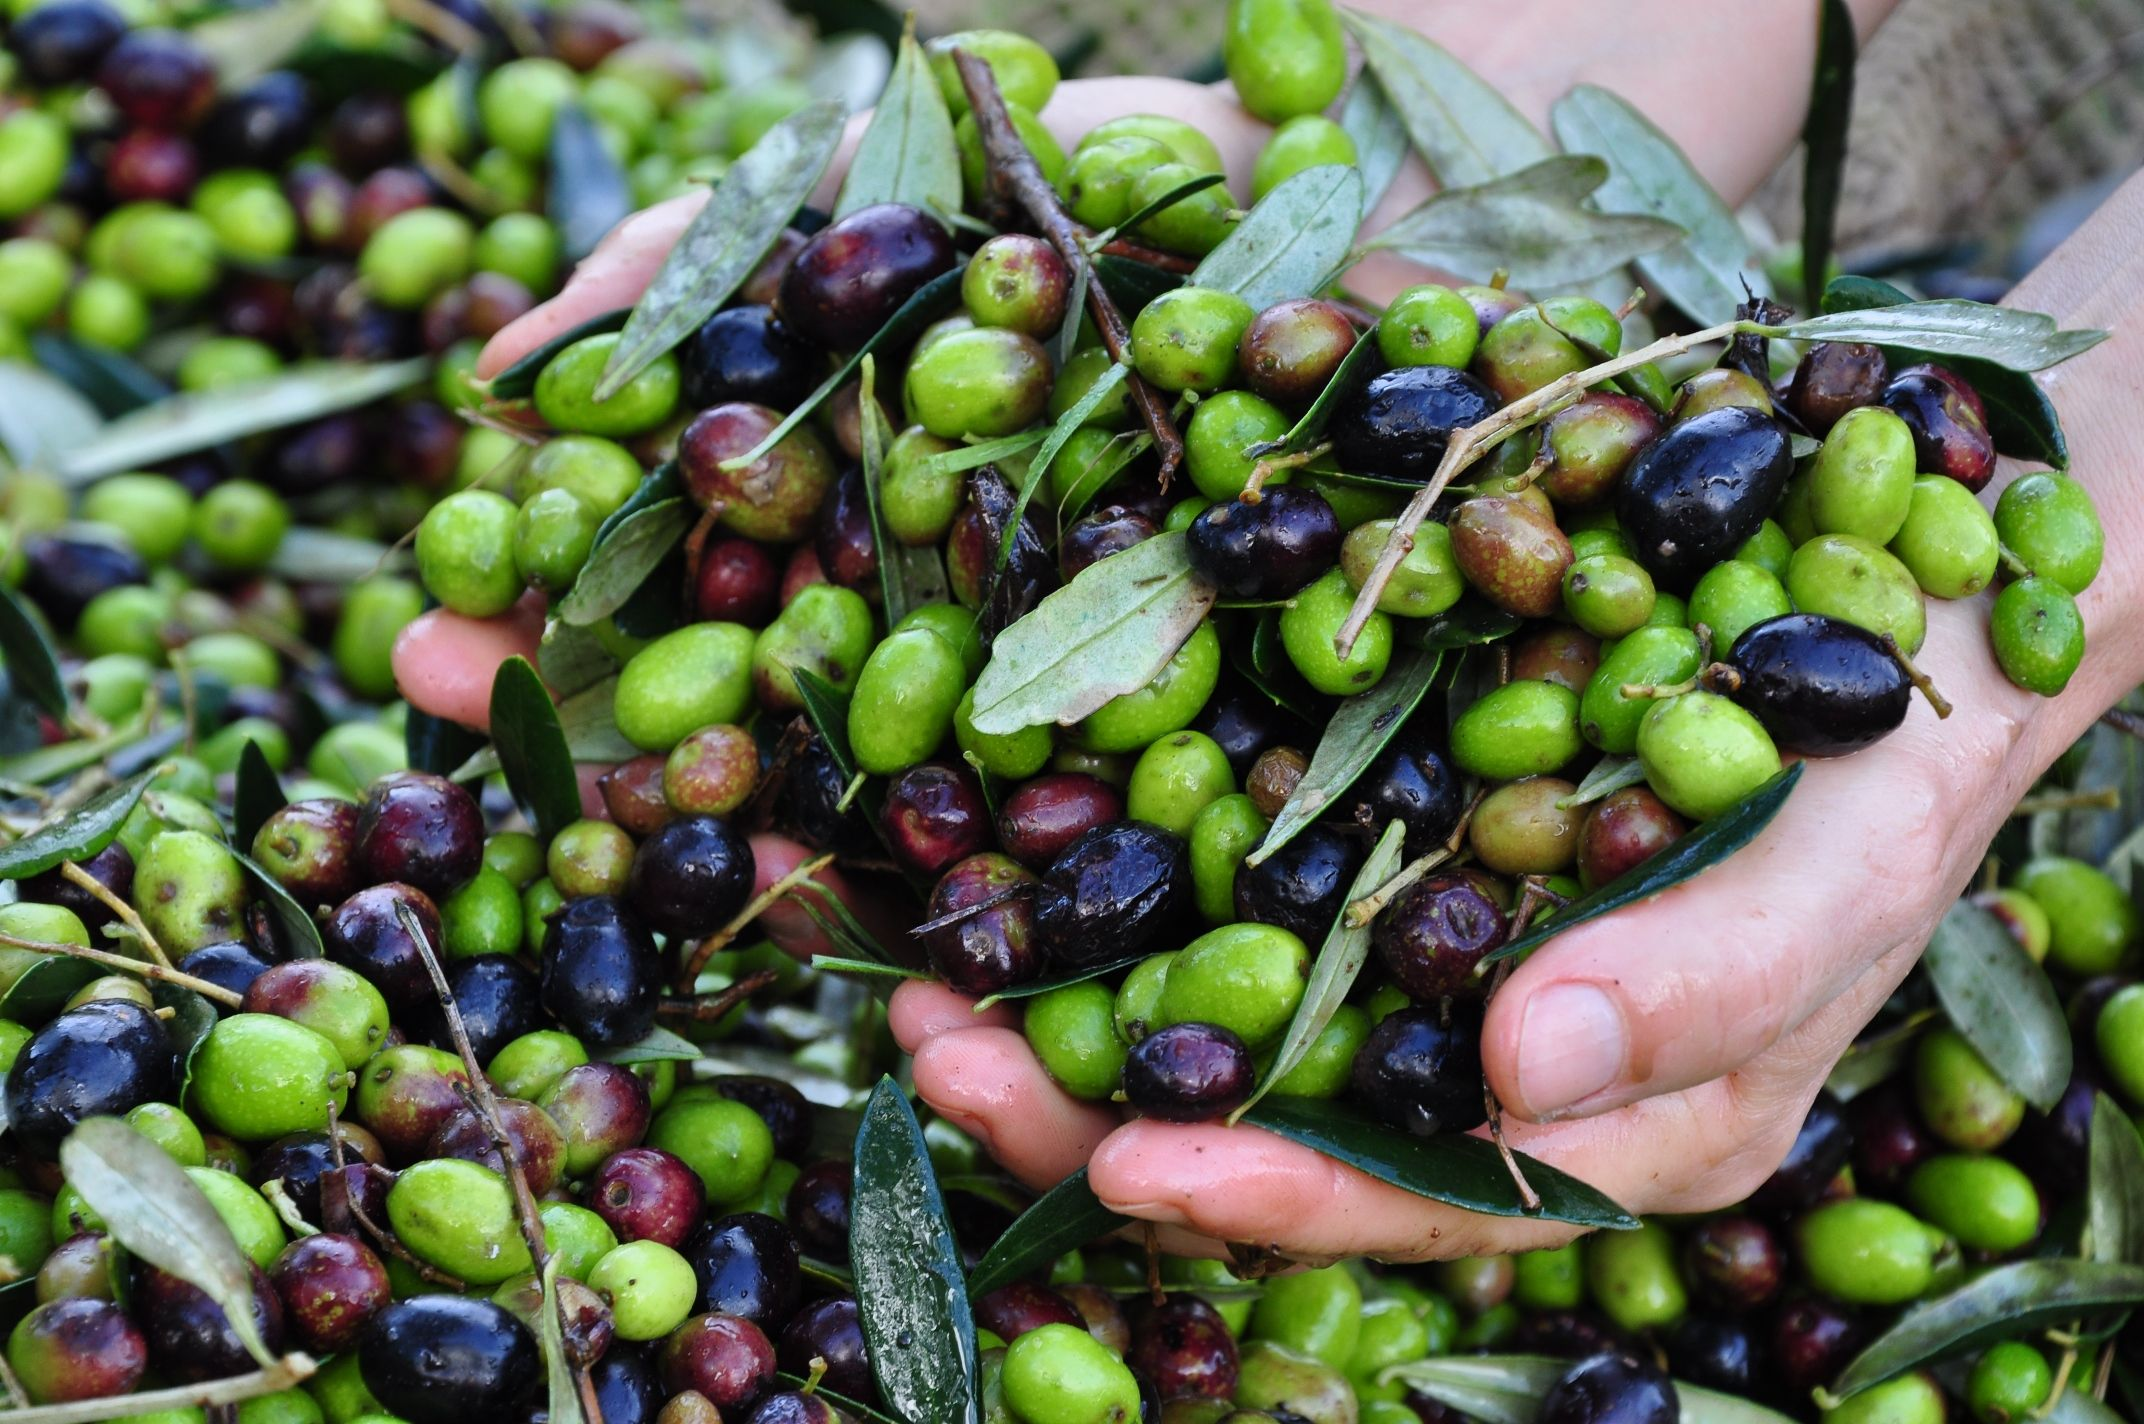 Olive extravergine, cultivar Moraiolo, Leccino e Frantoio